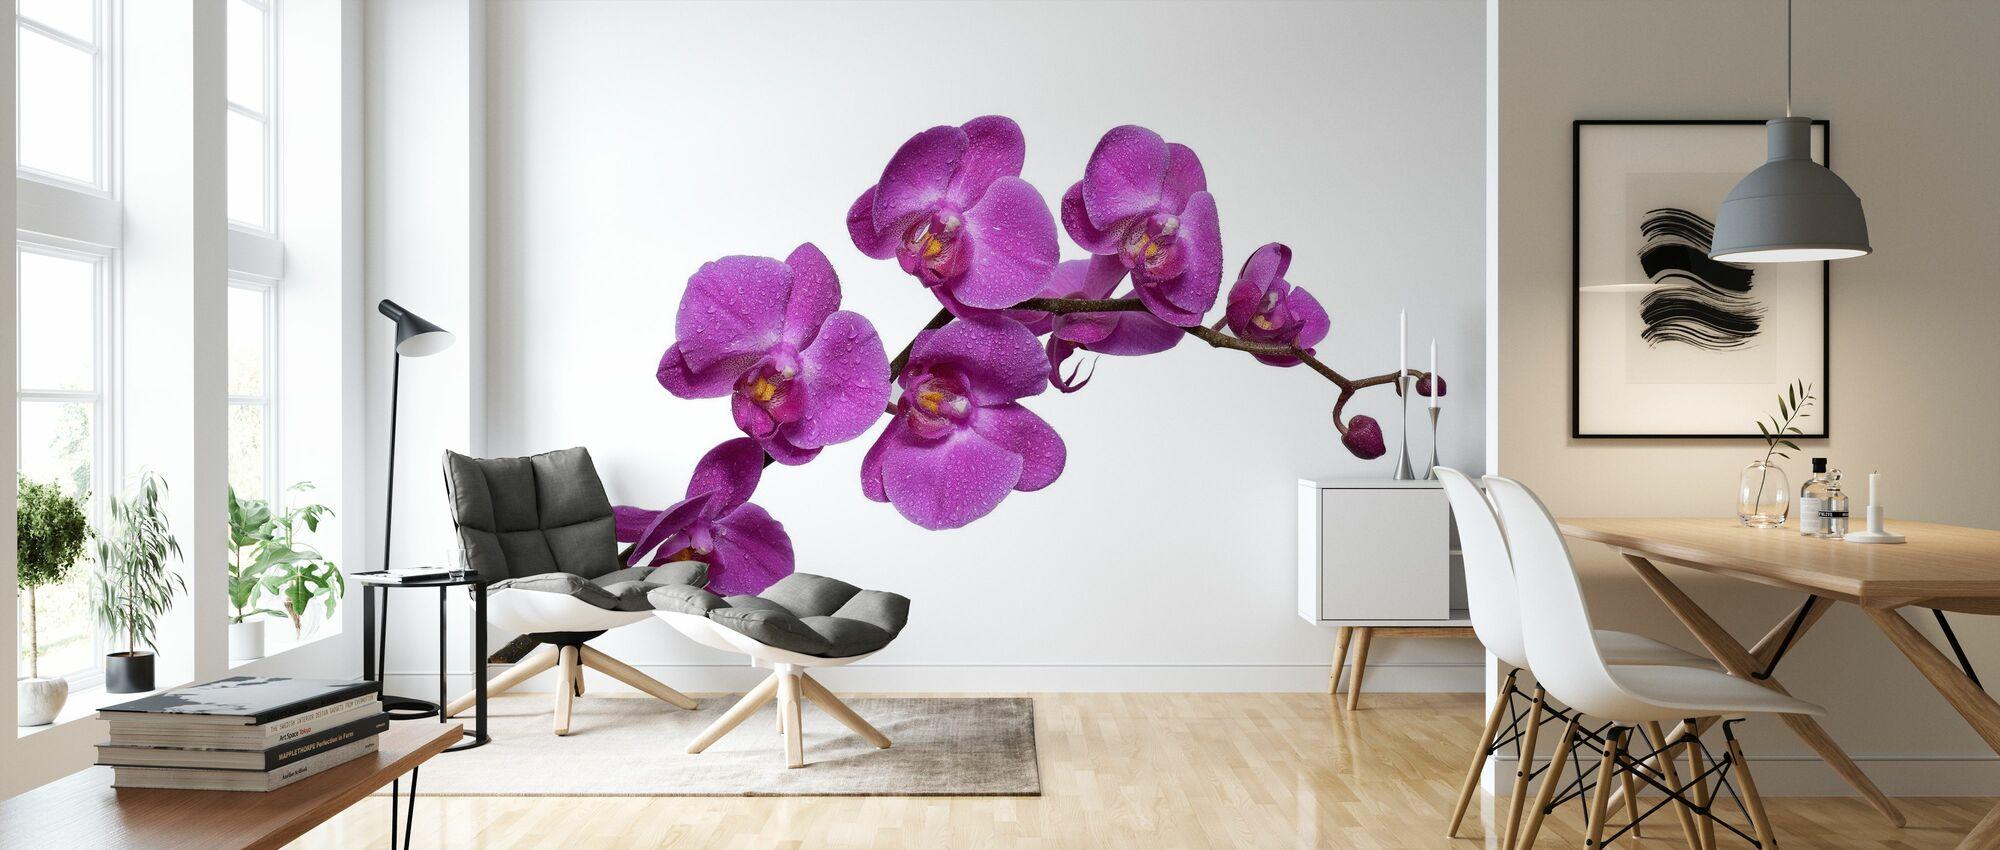 Skarpe orkideer - Tapet - Stue